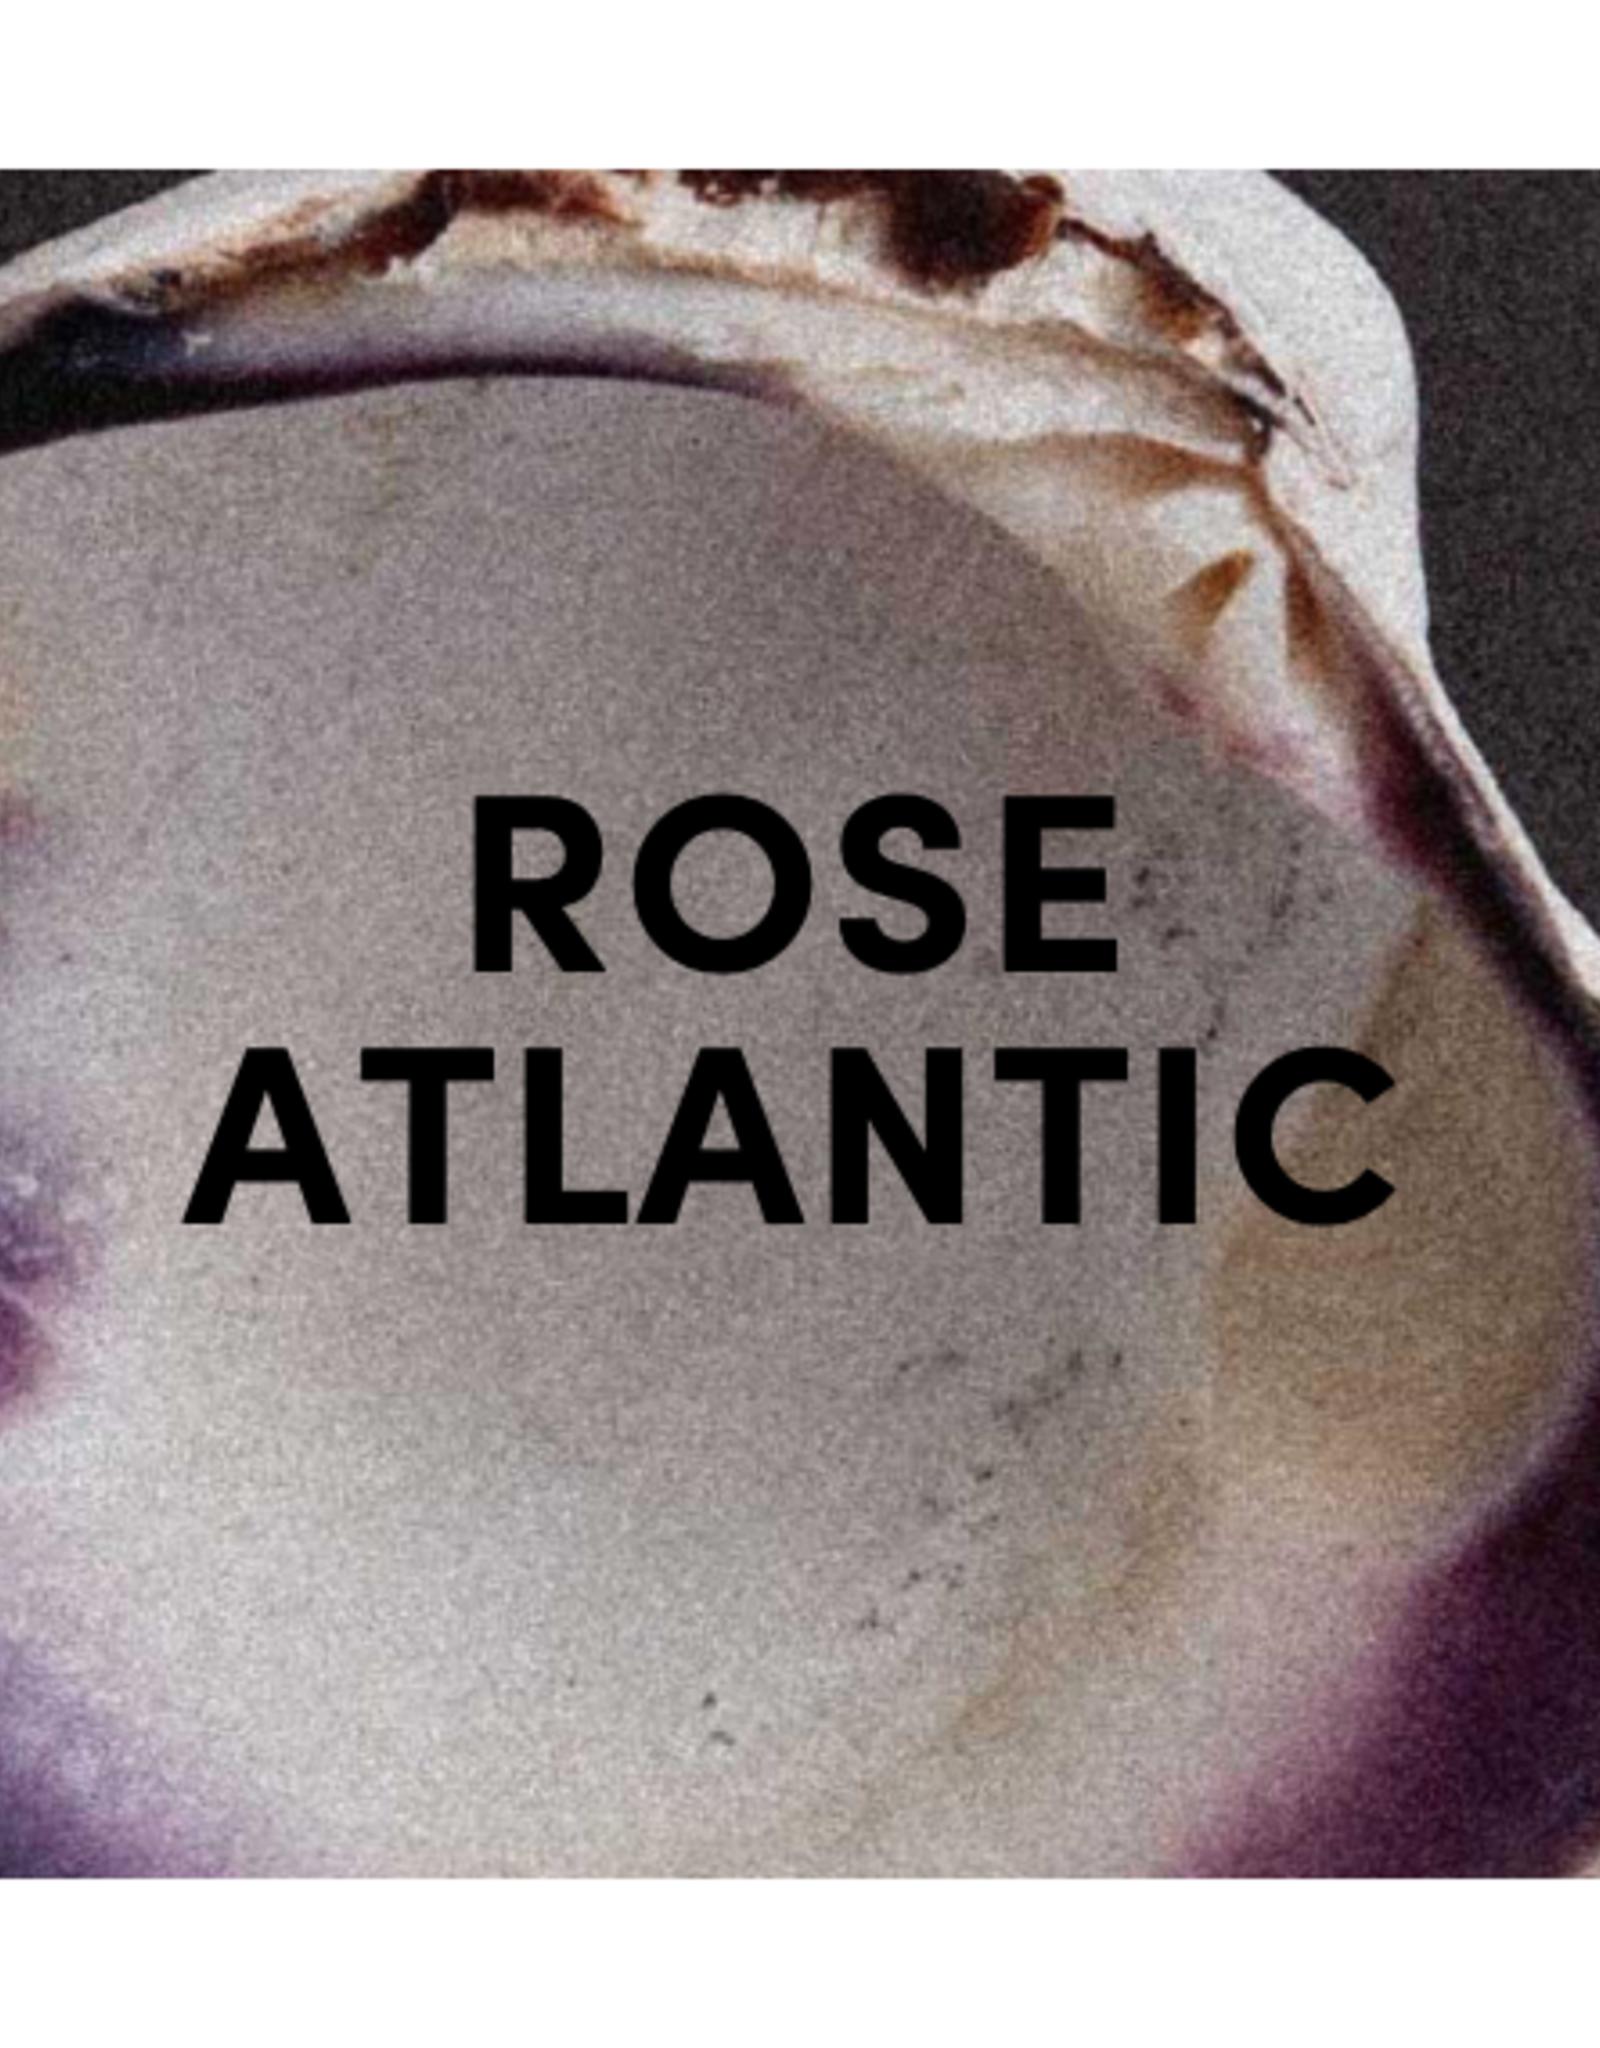 D.S. & DURGA Rose Atlantic - Body Wash - 8oz. (236mL)